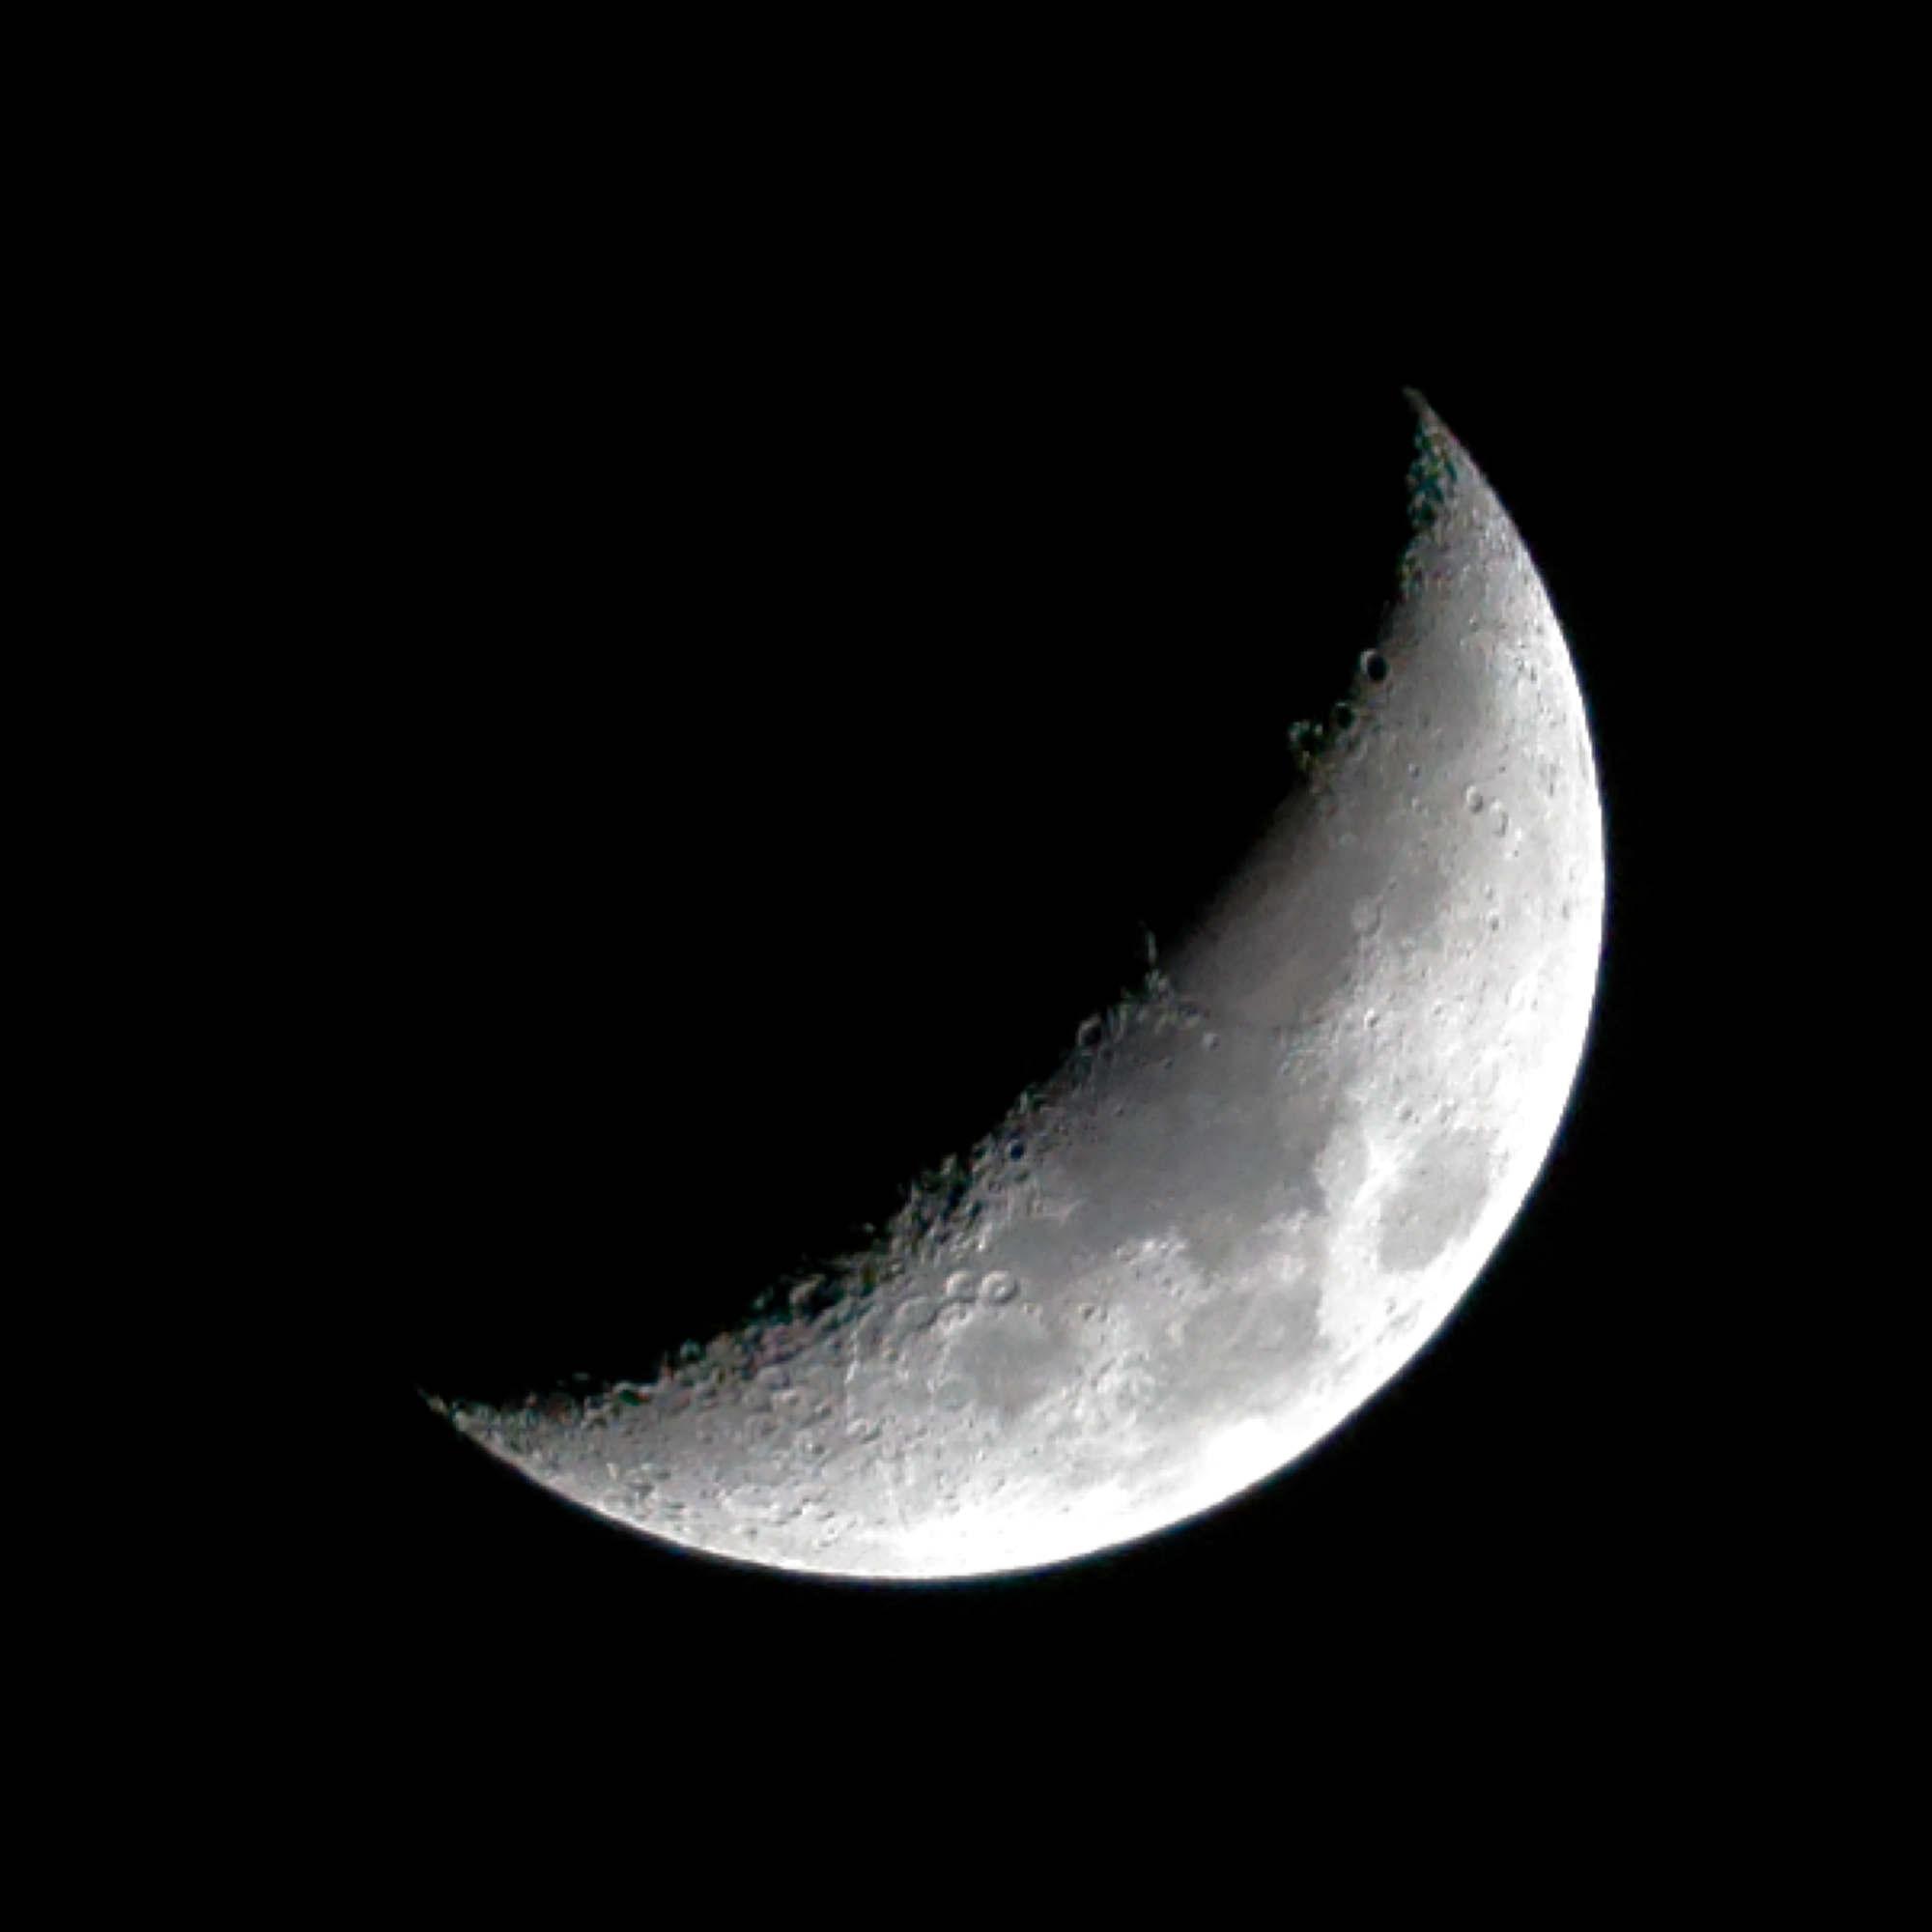 Lune 21_02_2018 recadrée